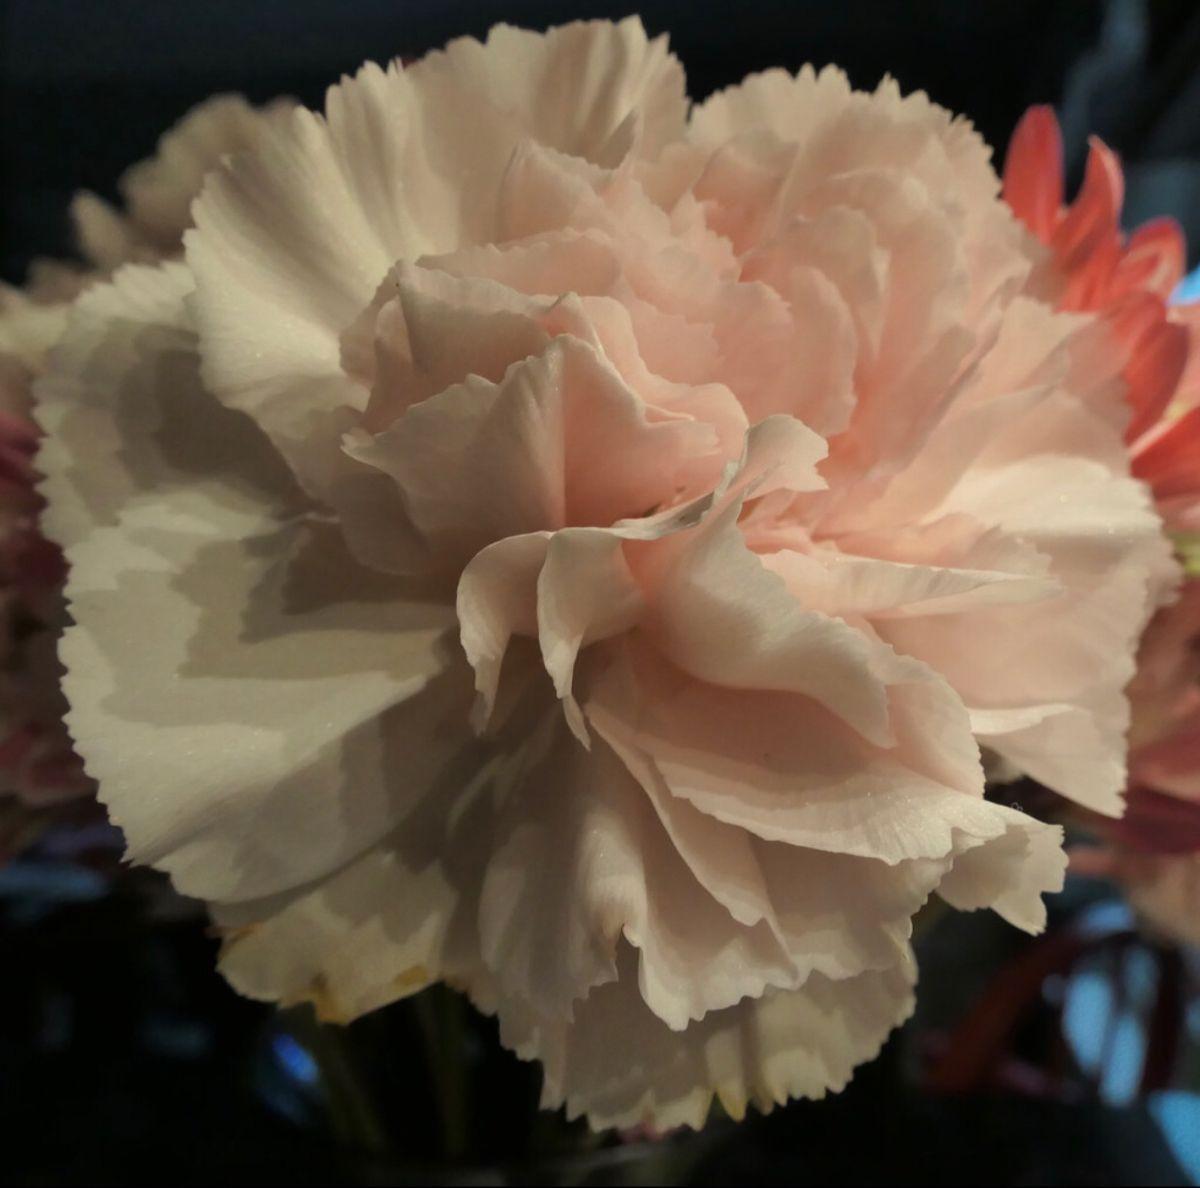 Carnation Flower In 2020 Carnation Flower Flowers For Sale Flowers